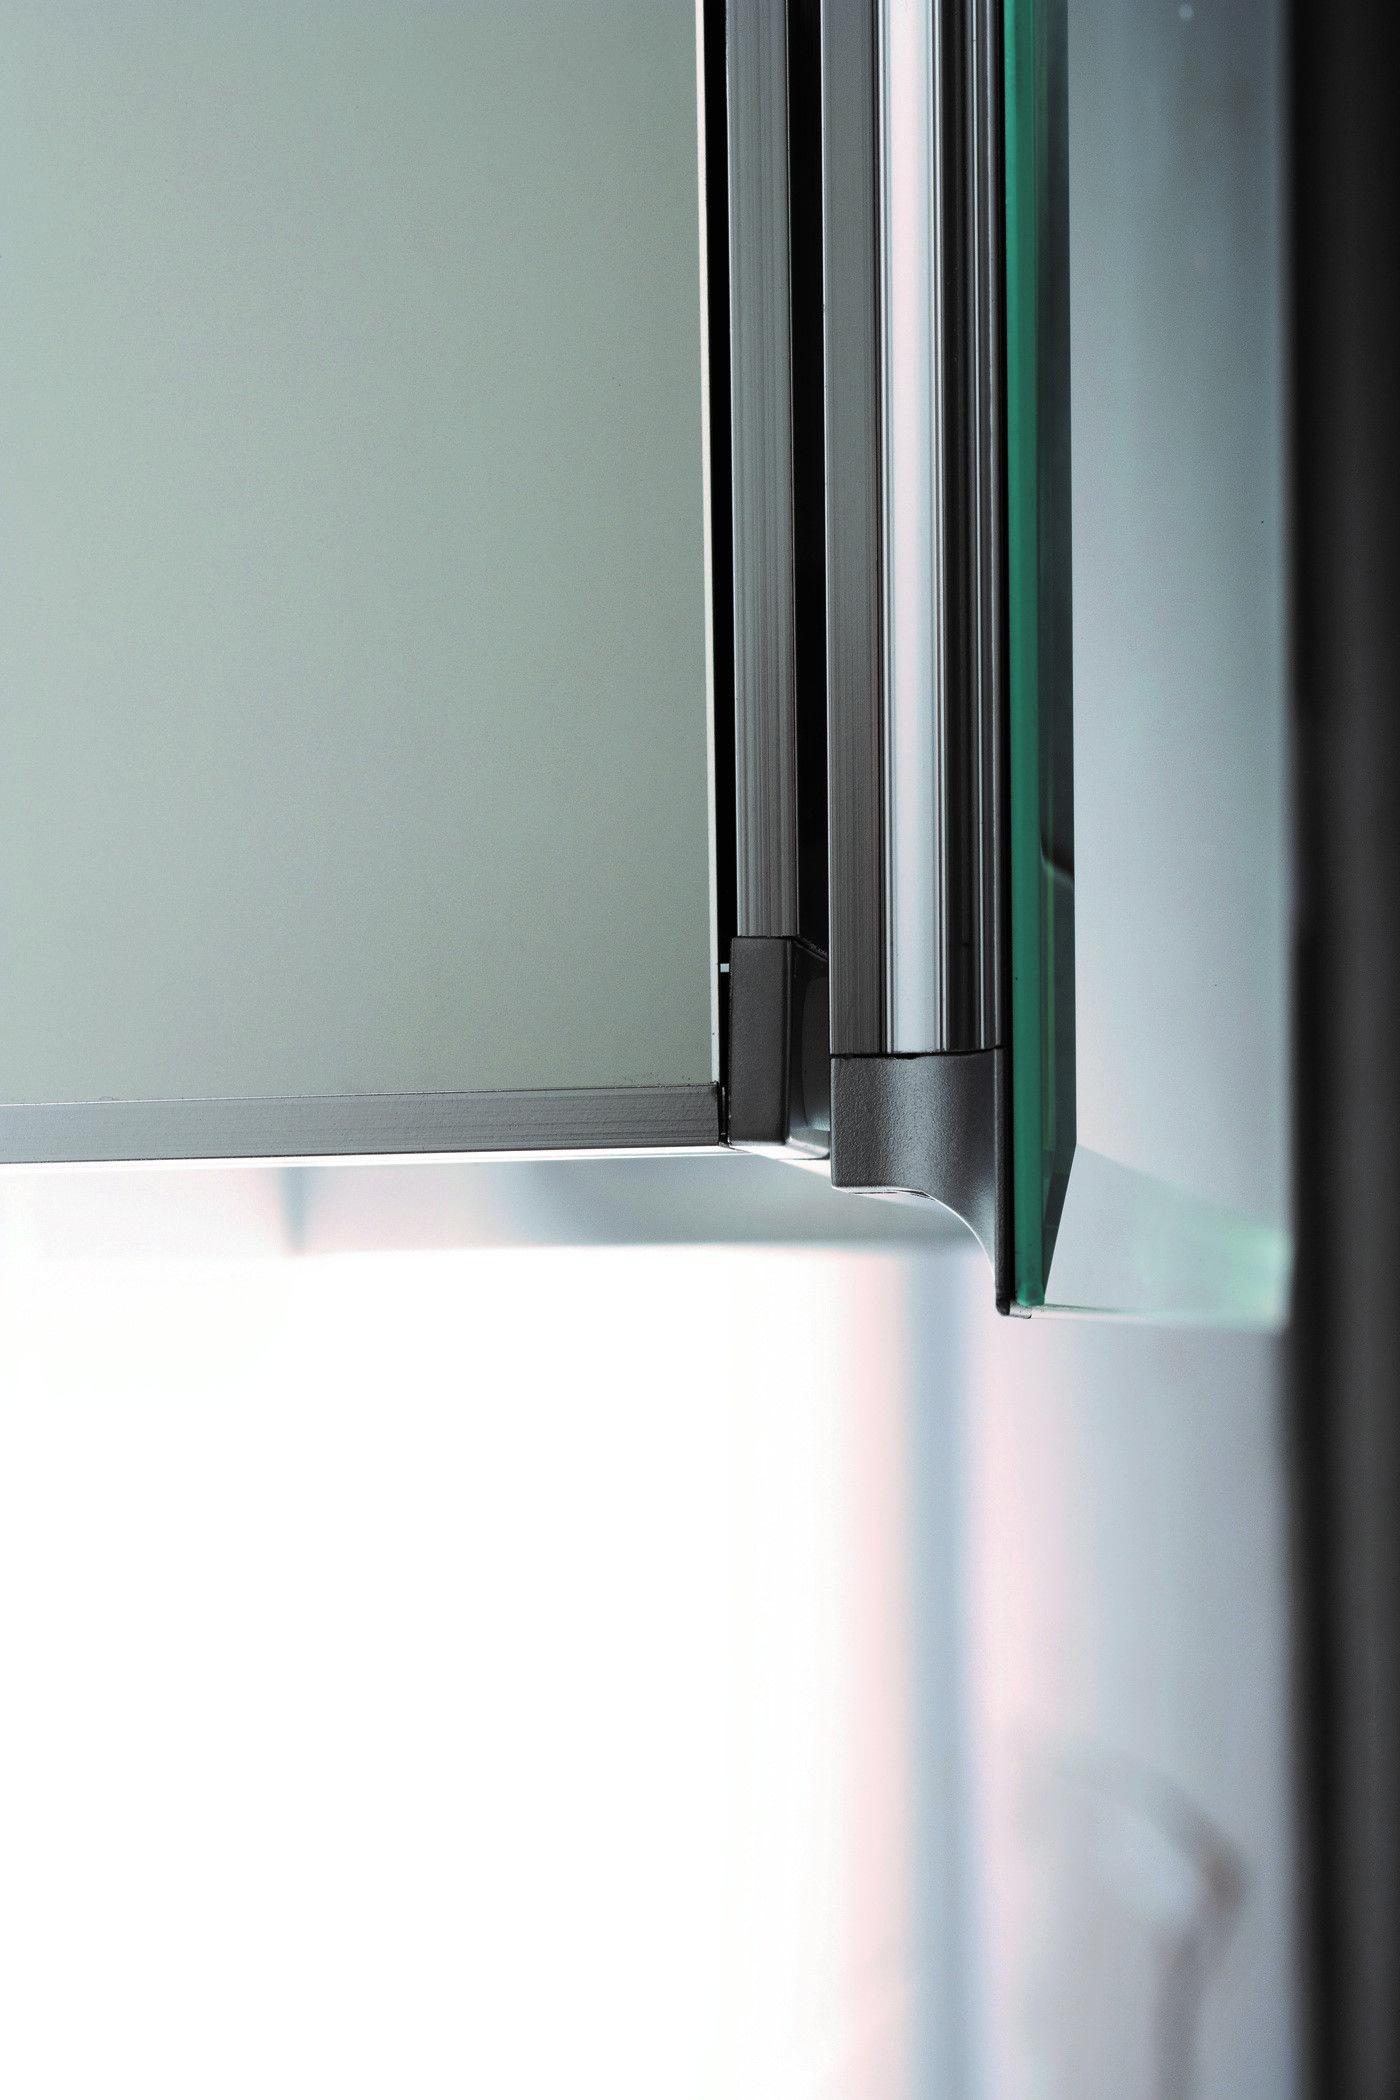 Jacuzzi Single Door Medicine Cabinet In 2019 Jacuzzi Medicine